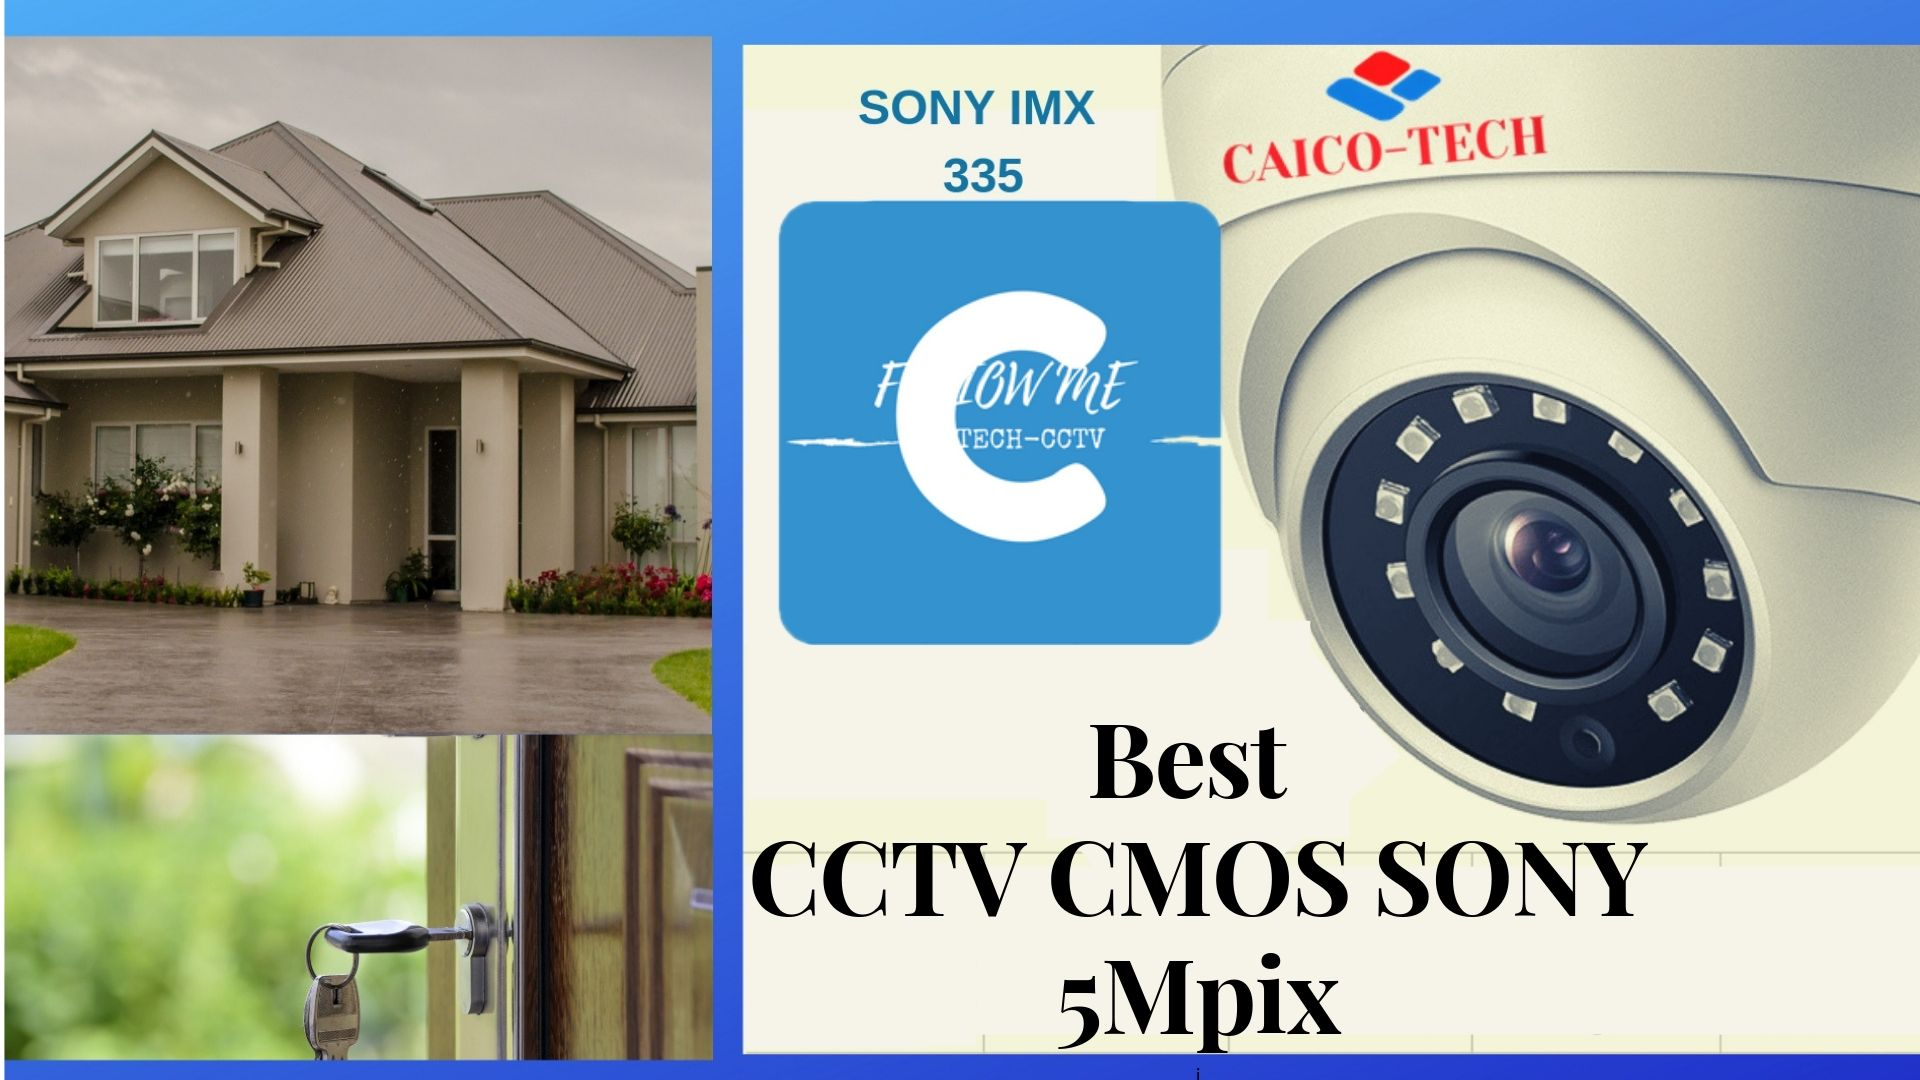 CAICO TECH CCTV DOME CAMERA AHD 5 Mpix CMOS SONY IMX 335